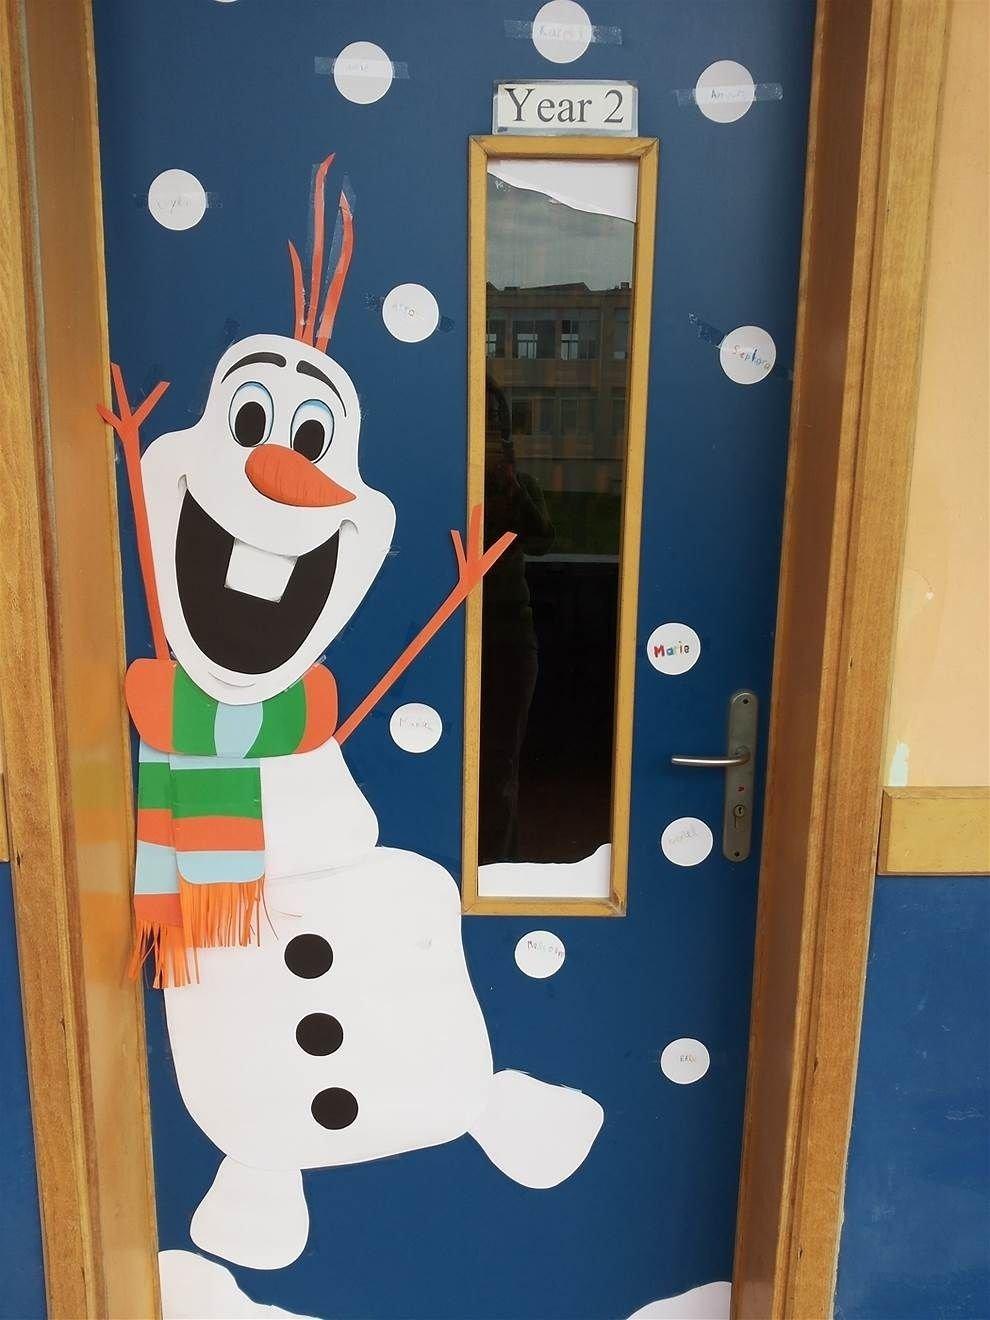 10 Wonderful Christmas Door Ideas For School image result for christmas door decorations for school christmas